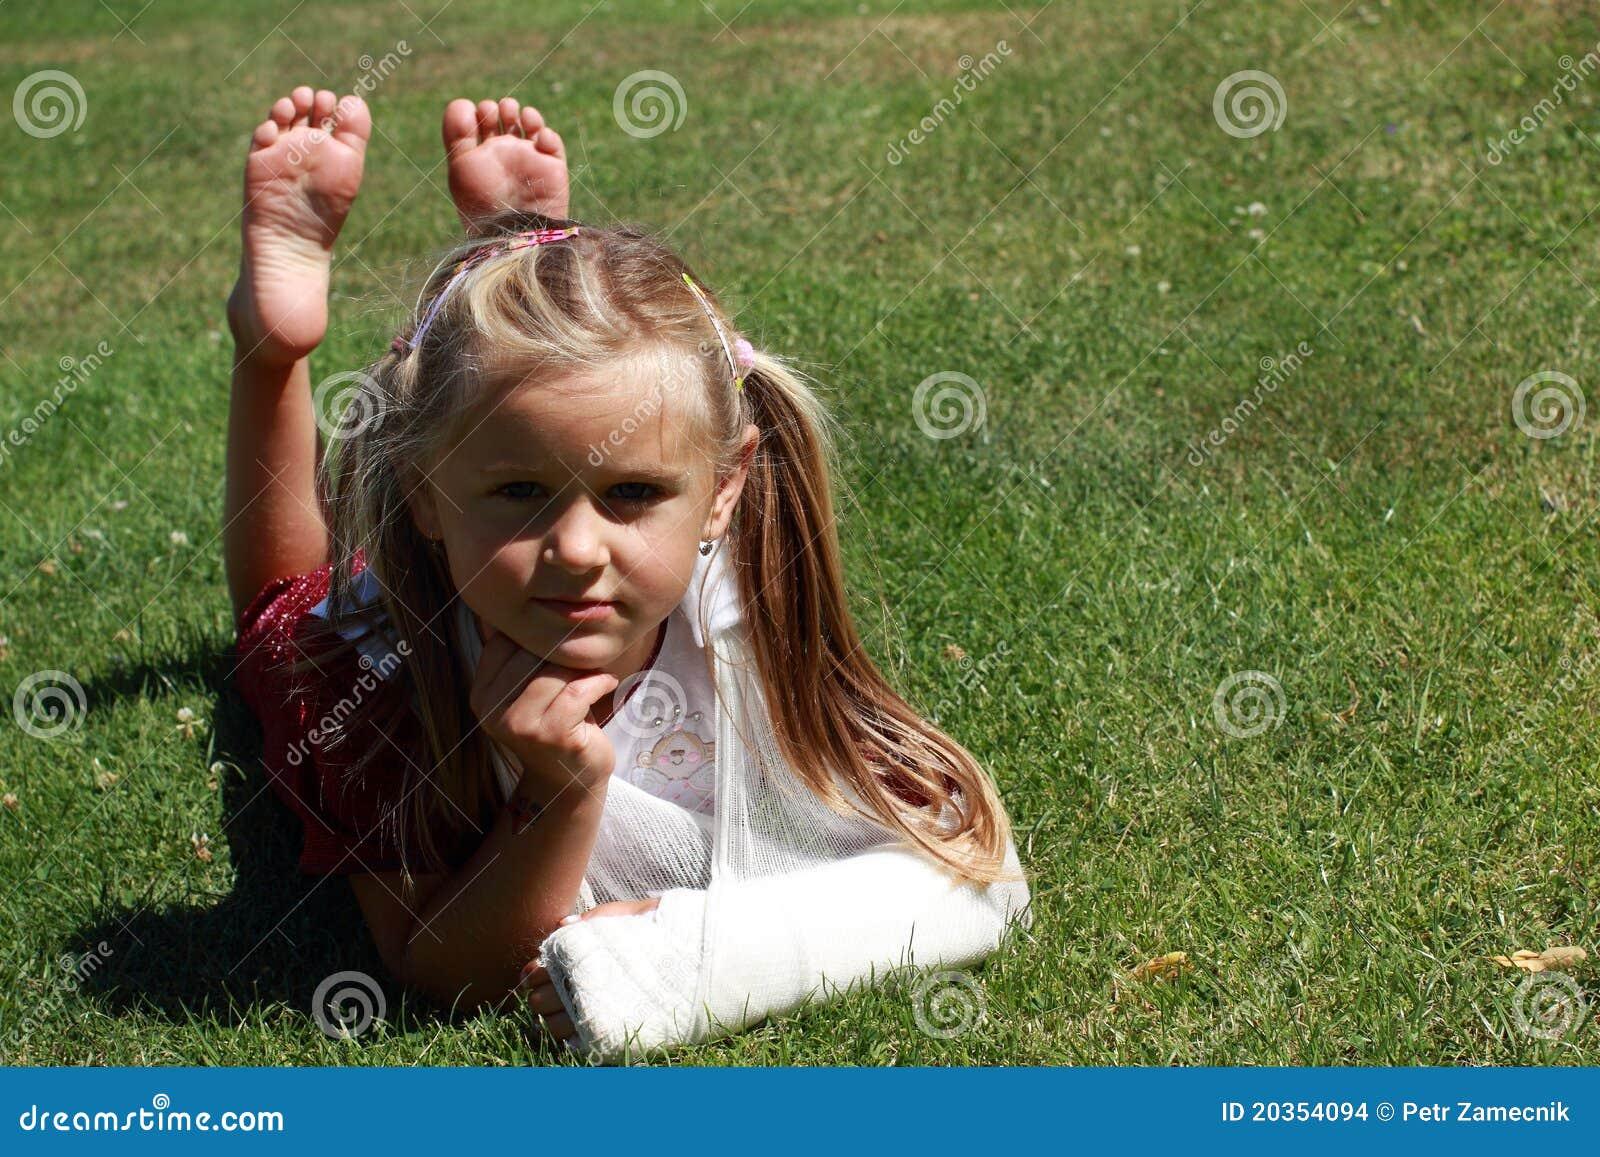 Lying girl with broken hand